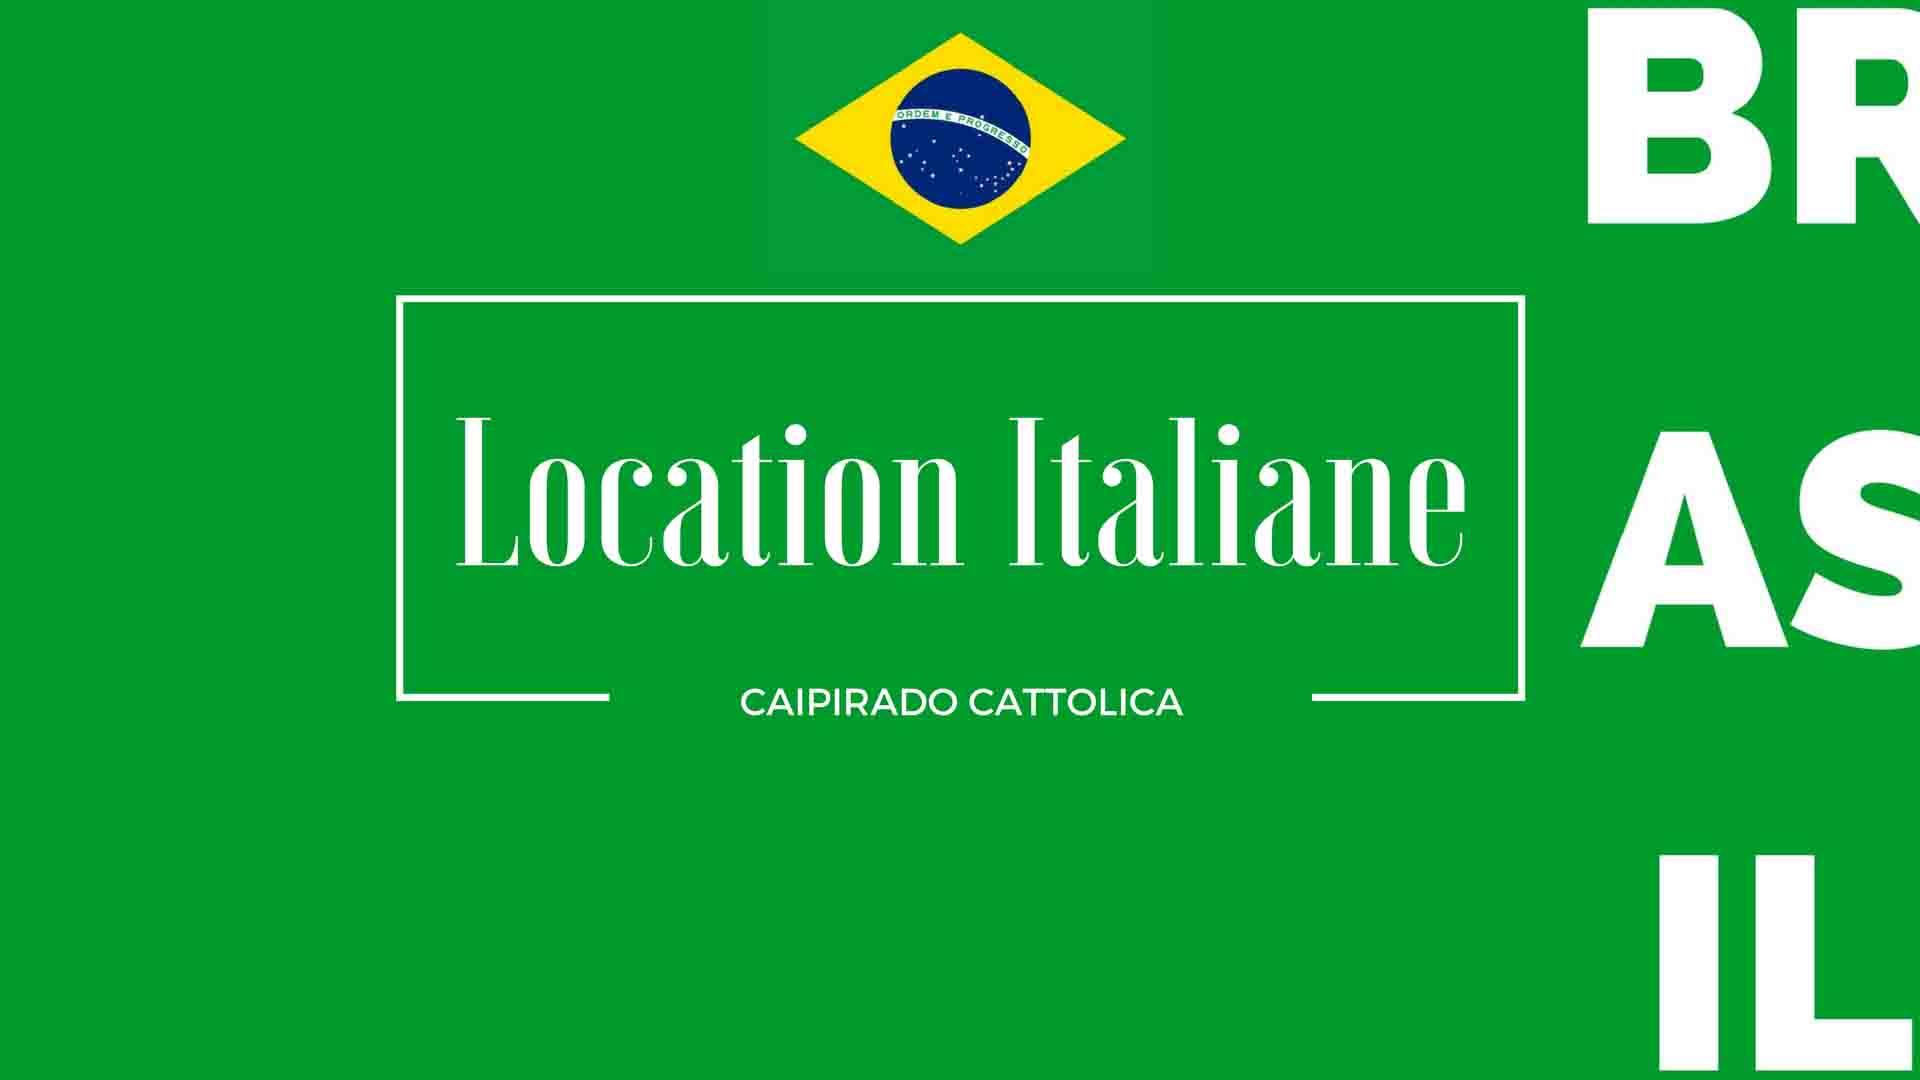 Caipirado ristorante brasiliano cattolica